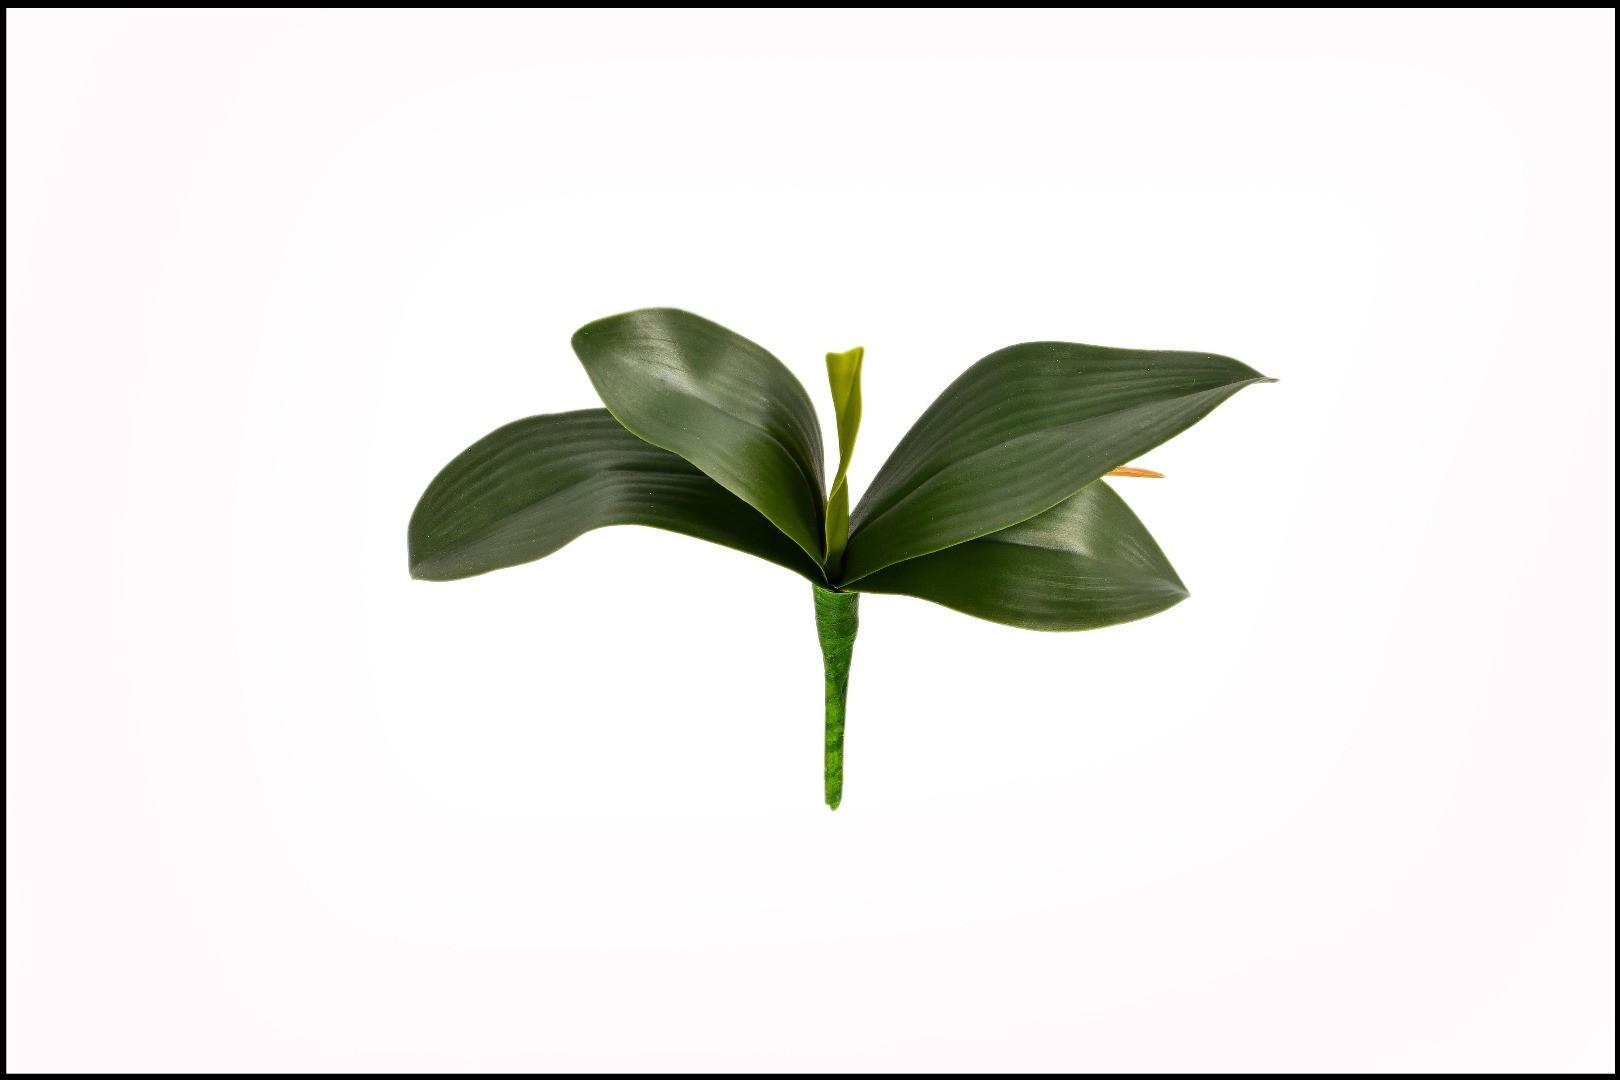 WK18063 - Folha de Orquídea - 25 Cm